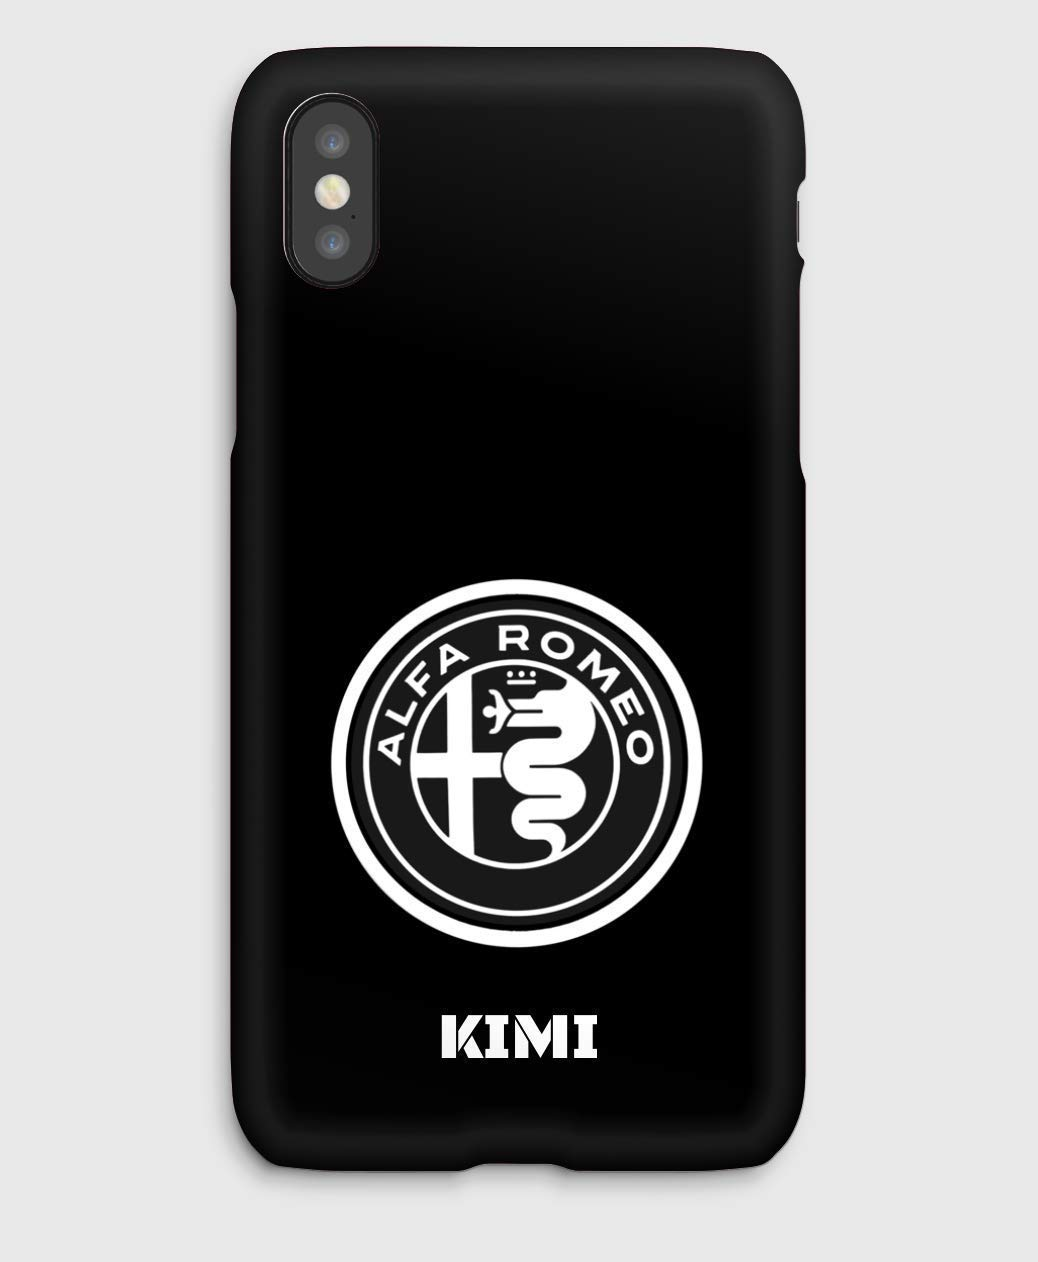 Kimi F1 Sauber Alfa Romeo cover iPhone XS, XS Max, XR, X, 8, 8+, 7, 7+, 6S, 6, 6S+, 6+, 5C, 5, 5S, 5SE, 4S, 4,